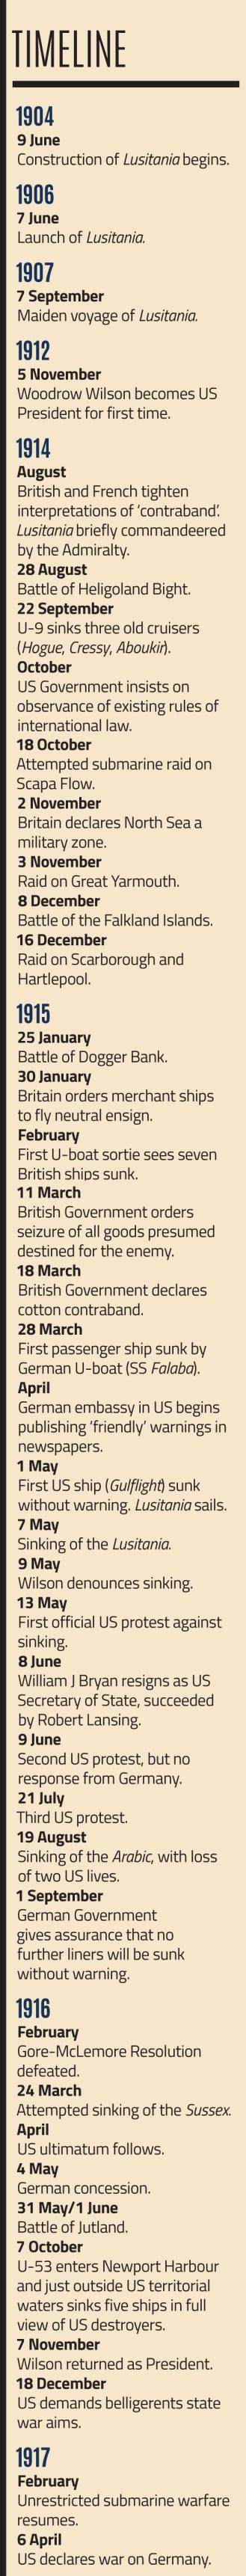 Lusitania-Timeline